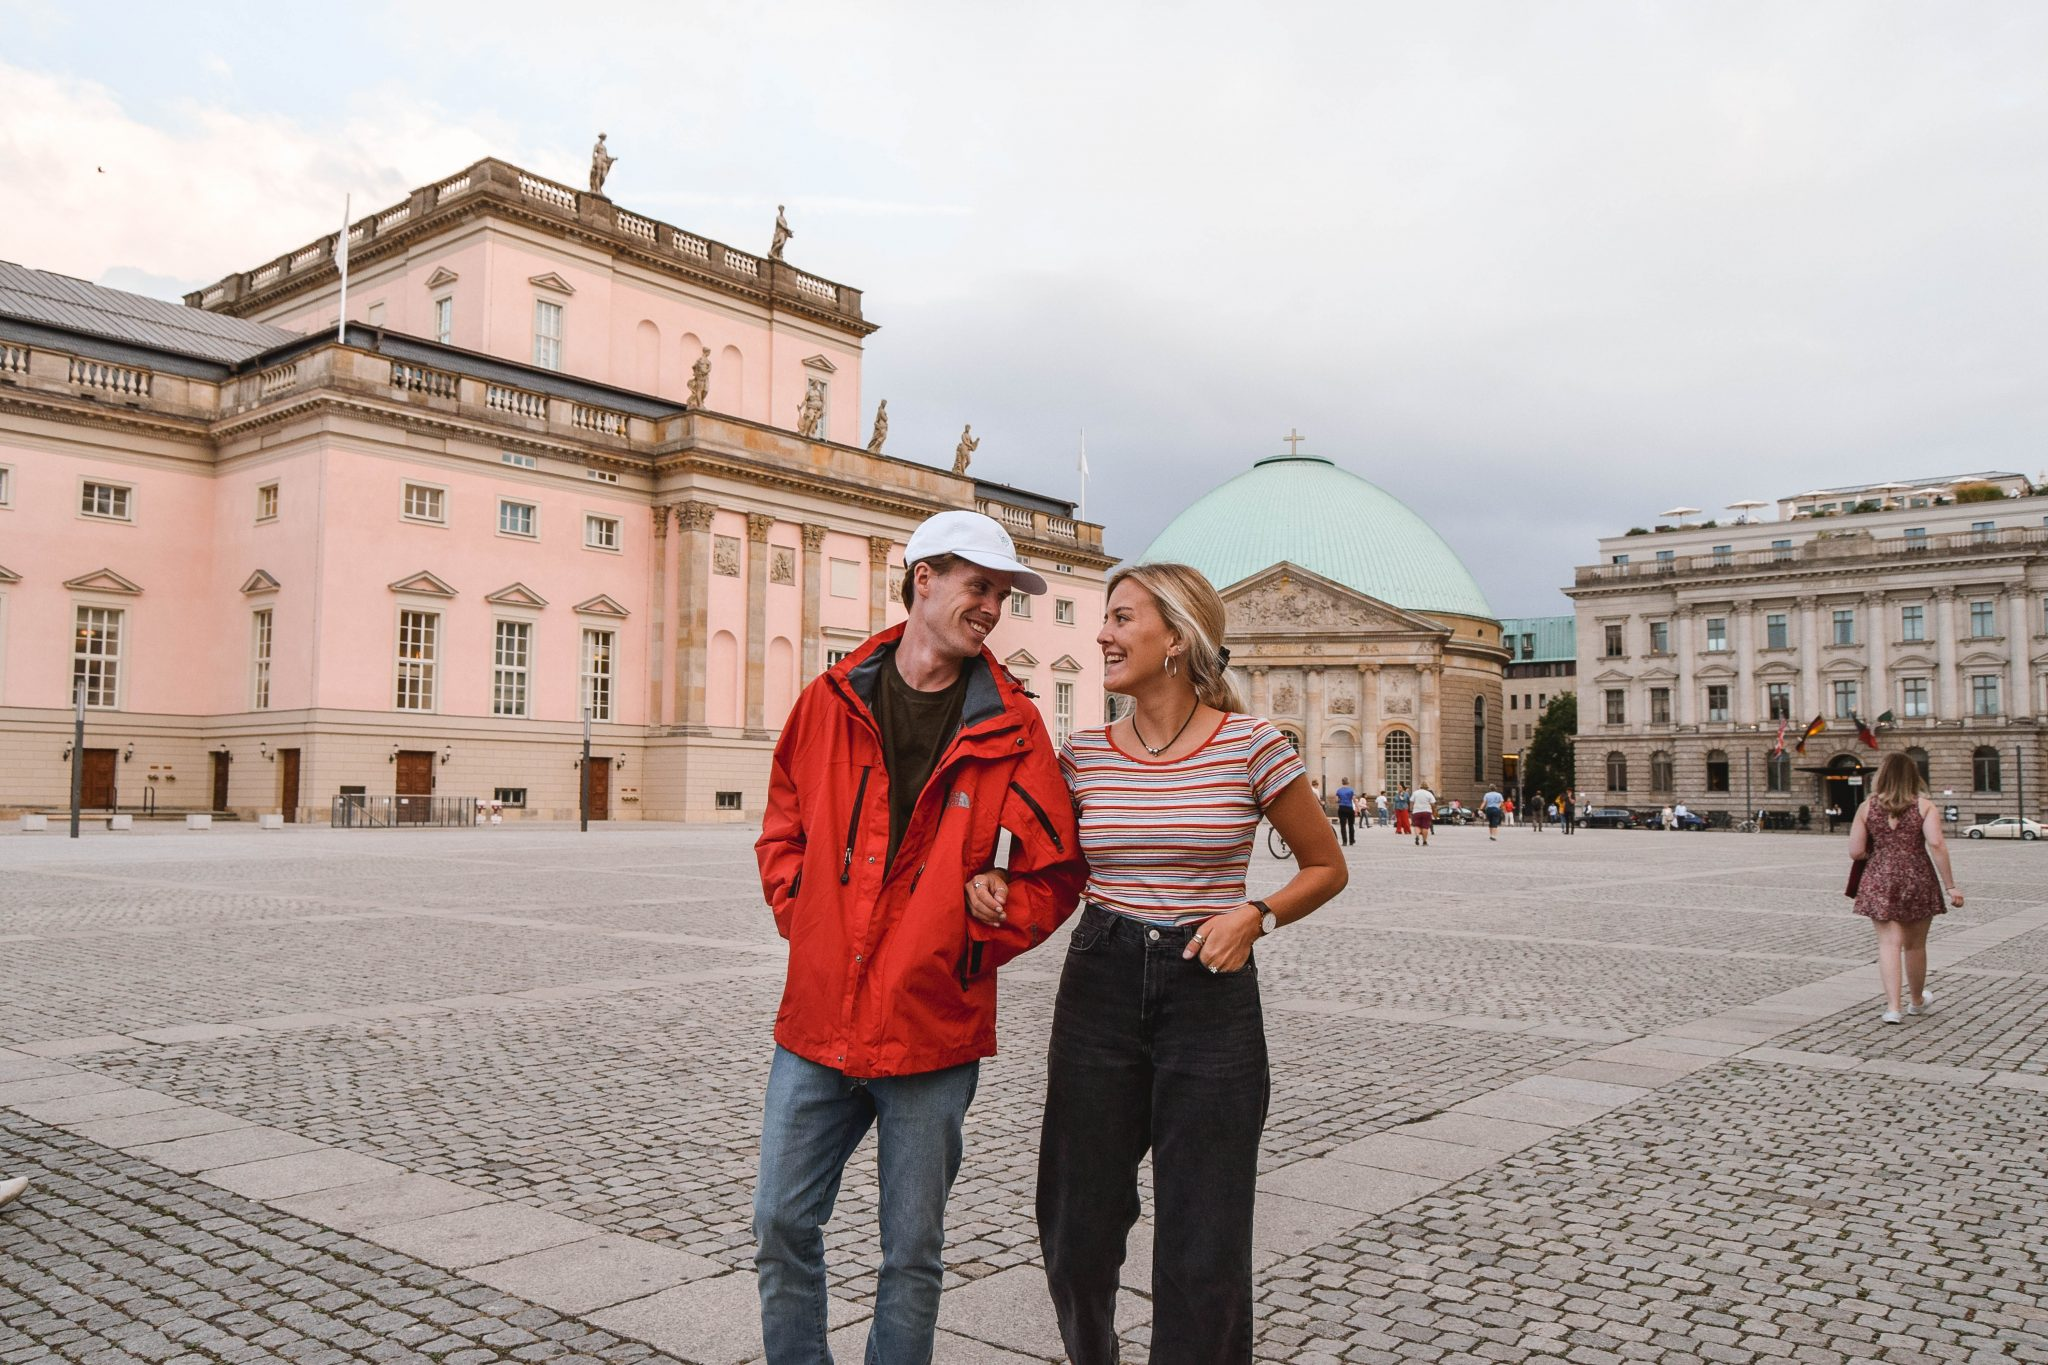 Wanderers & Warriors - Charlie & Lauren UK Travel Couple - Top Things To Do In Berlin Colonial Buildings Berlin